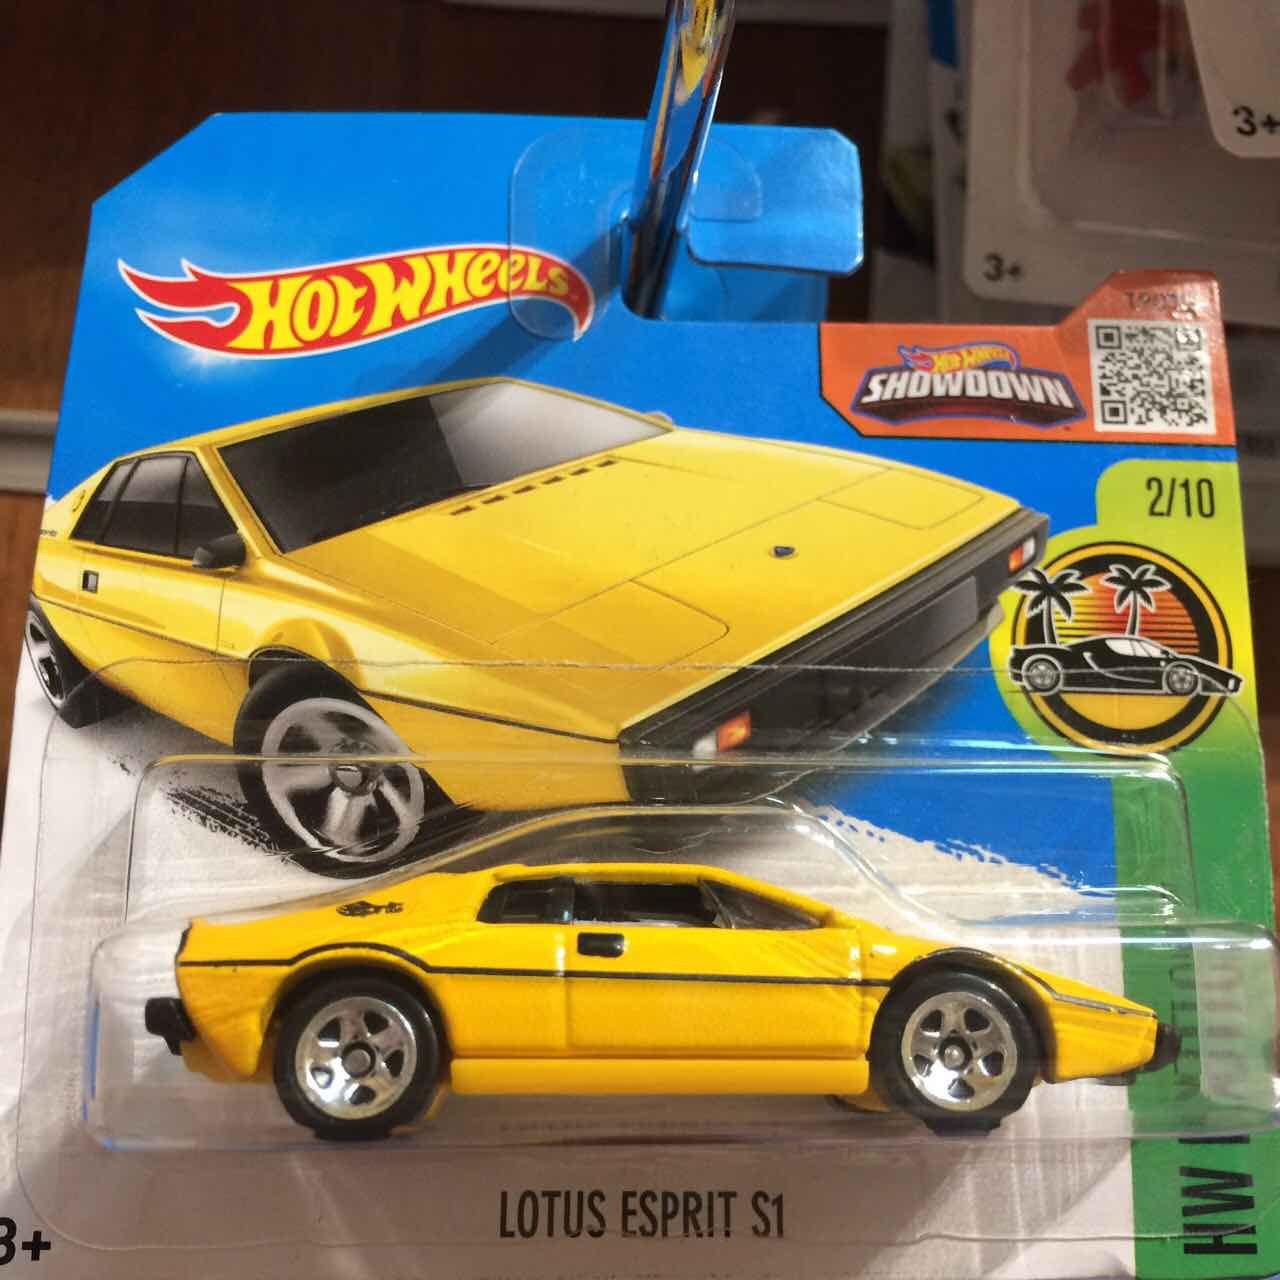 Hot Wheels базова модель Lotus Esprit S1